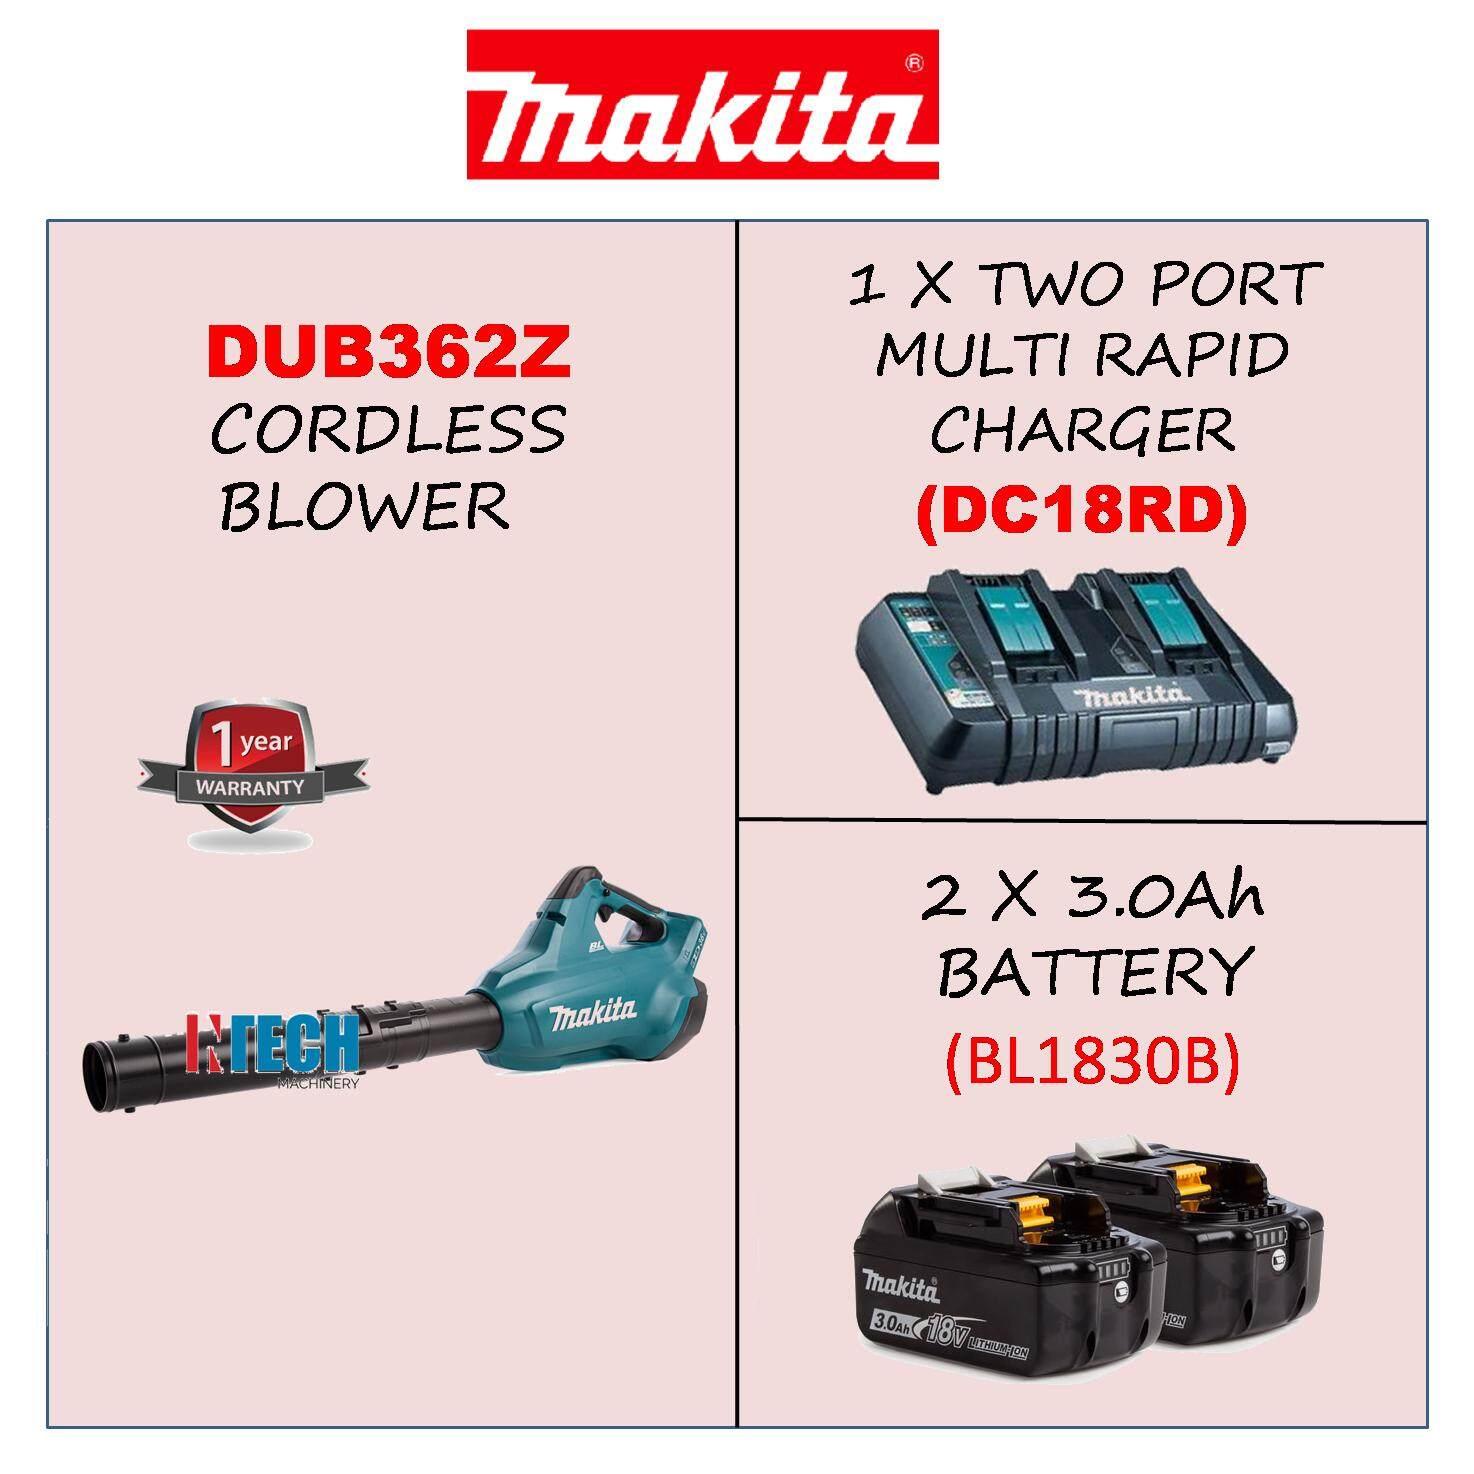 MAKITA DUB362Z CORDLESS BLOWER C/W 2 X 3.0Ah BATTERY, 1 X TWO PORT MULTI RAPID CHARGER